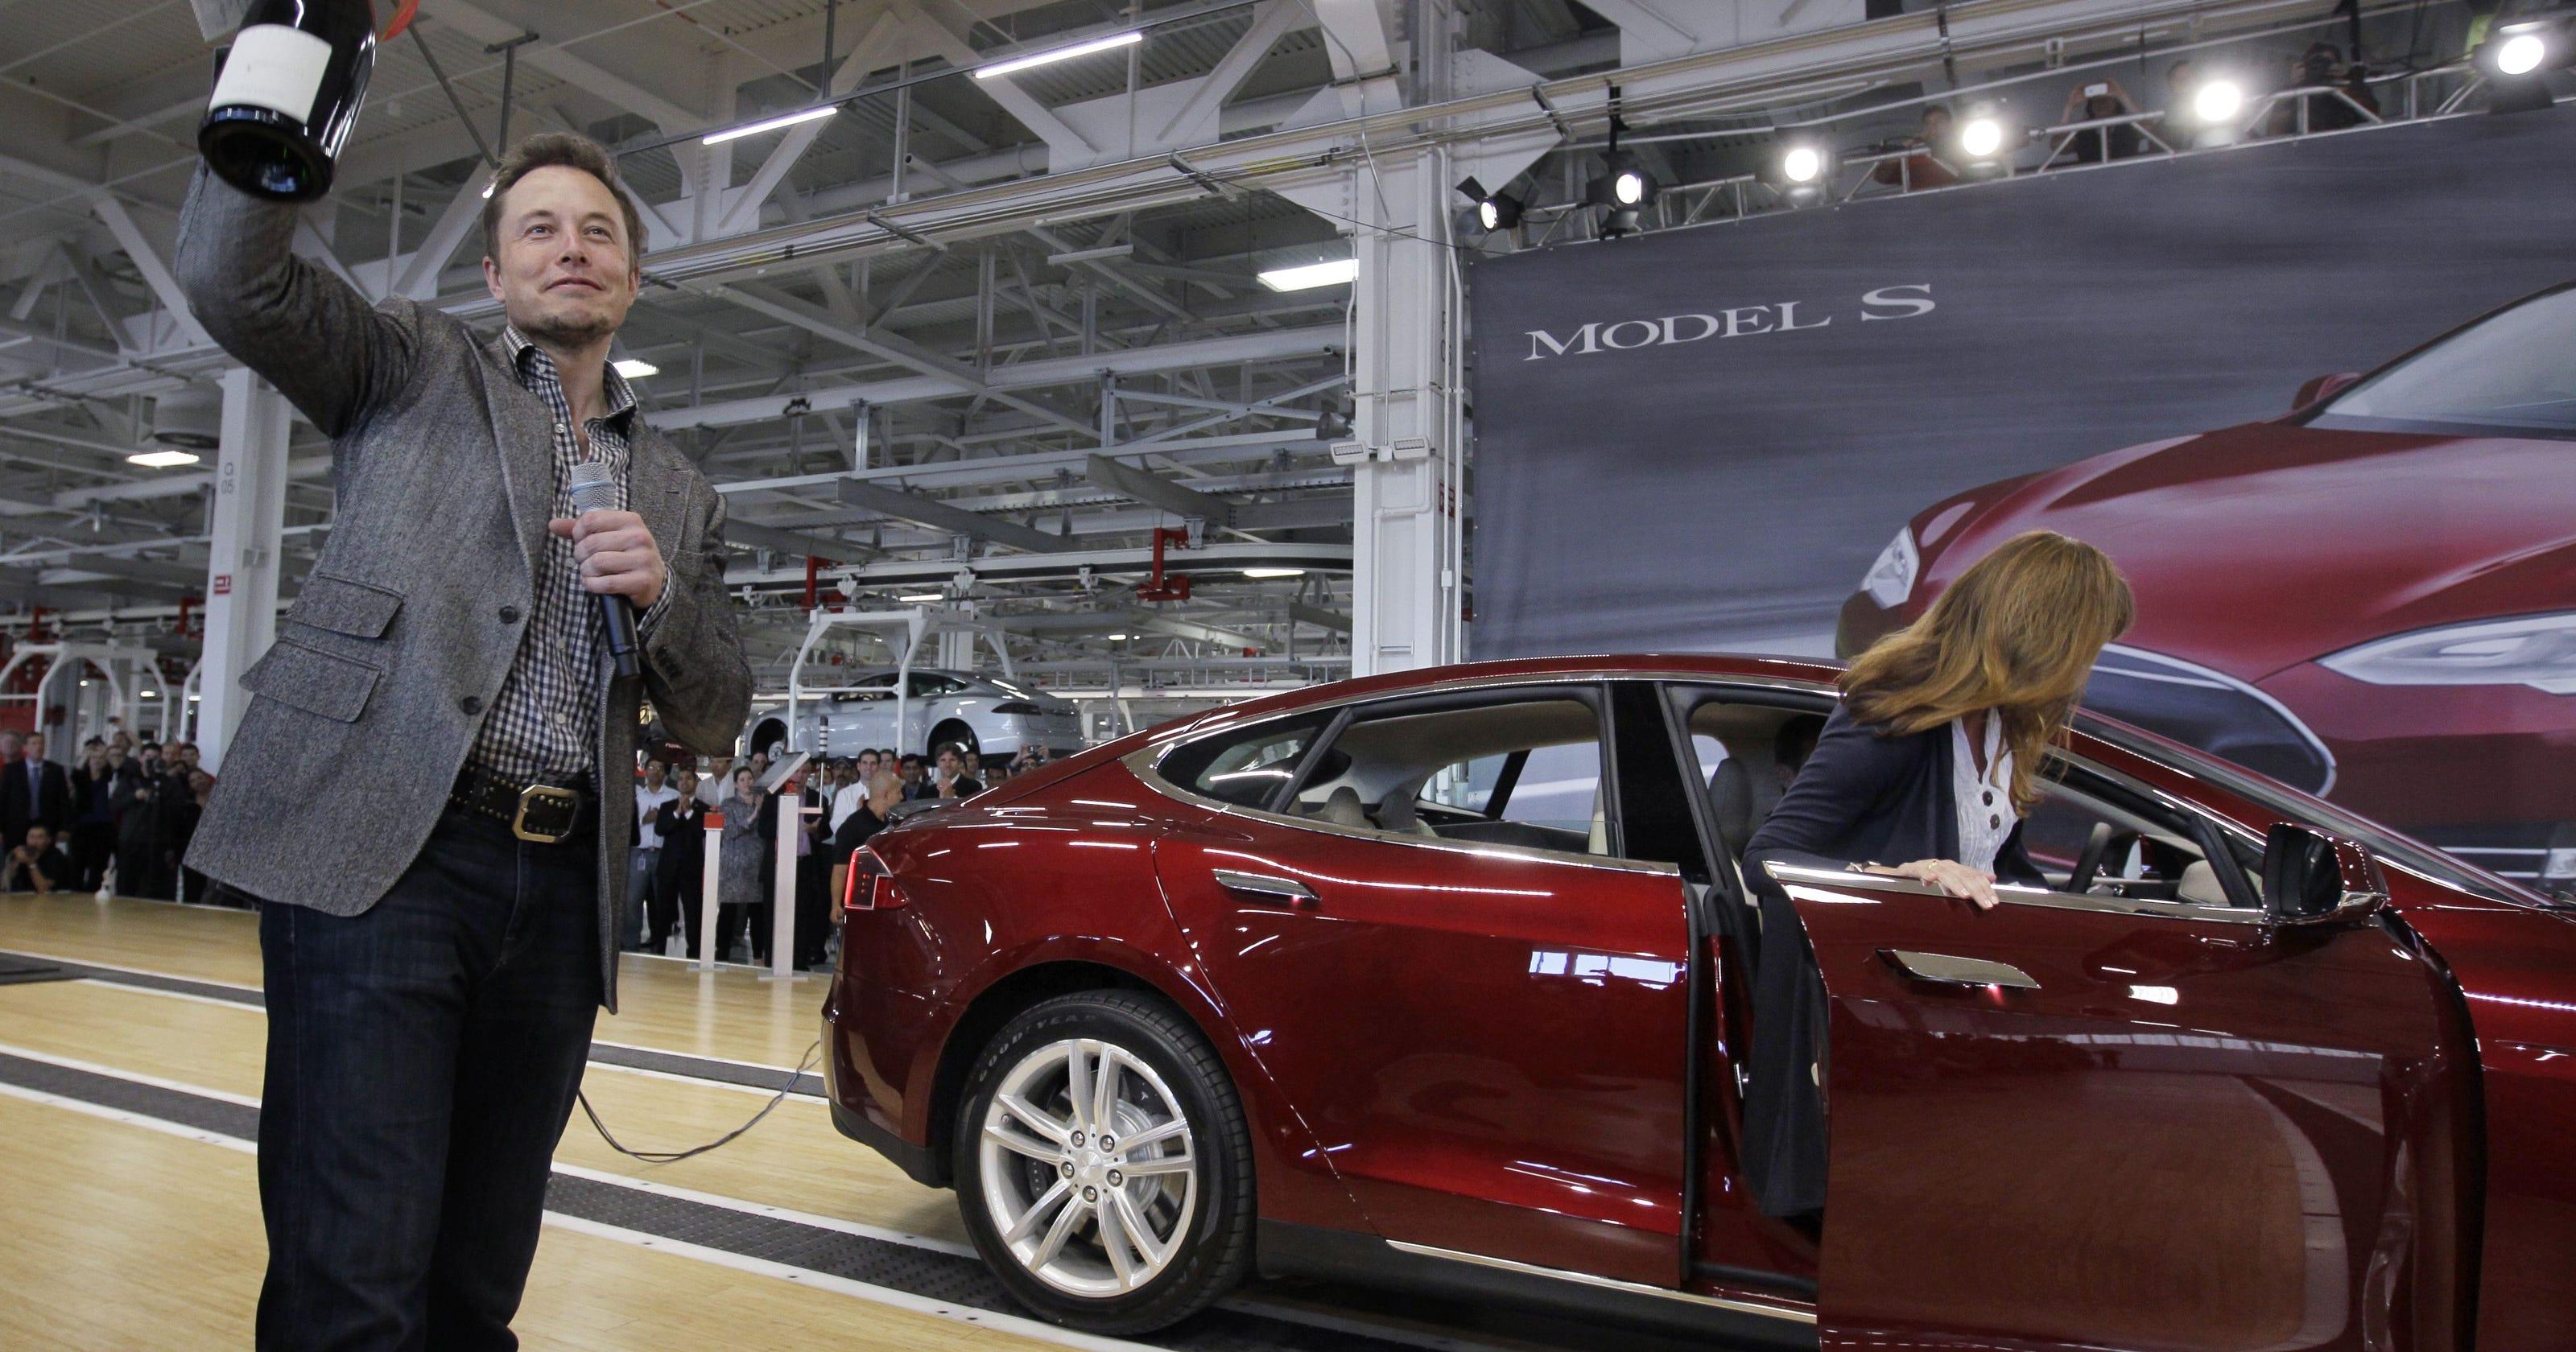 Tesla plant to restart production after coronavirus shutdown